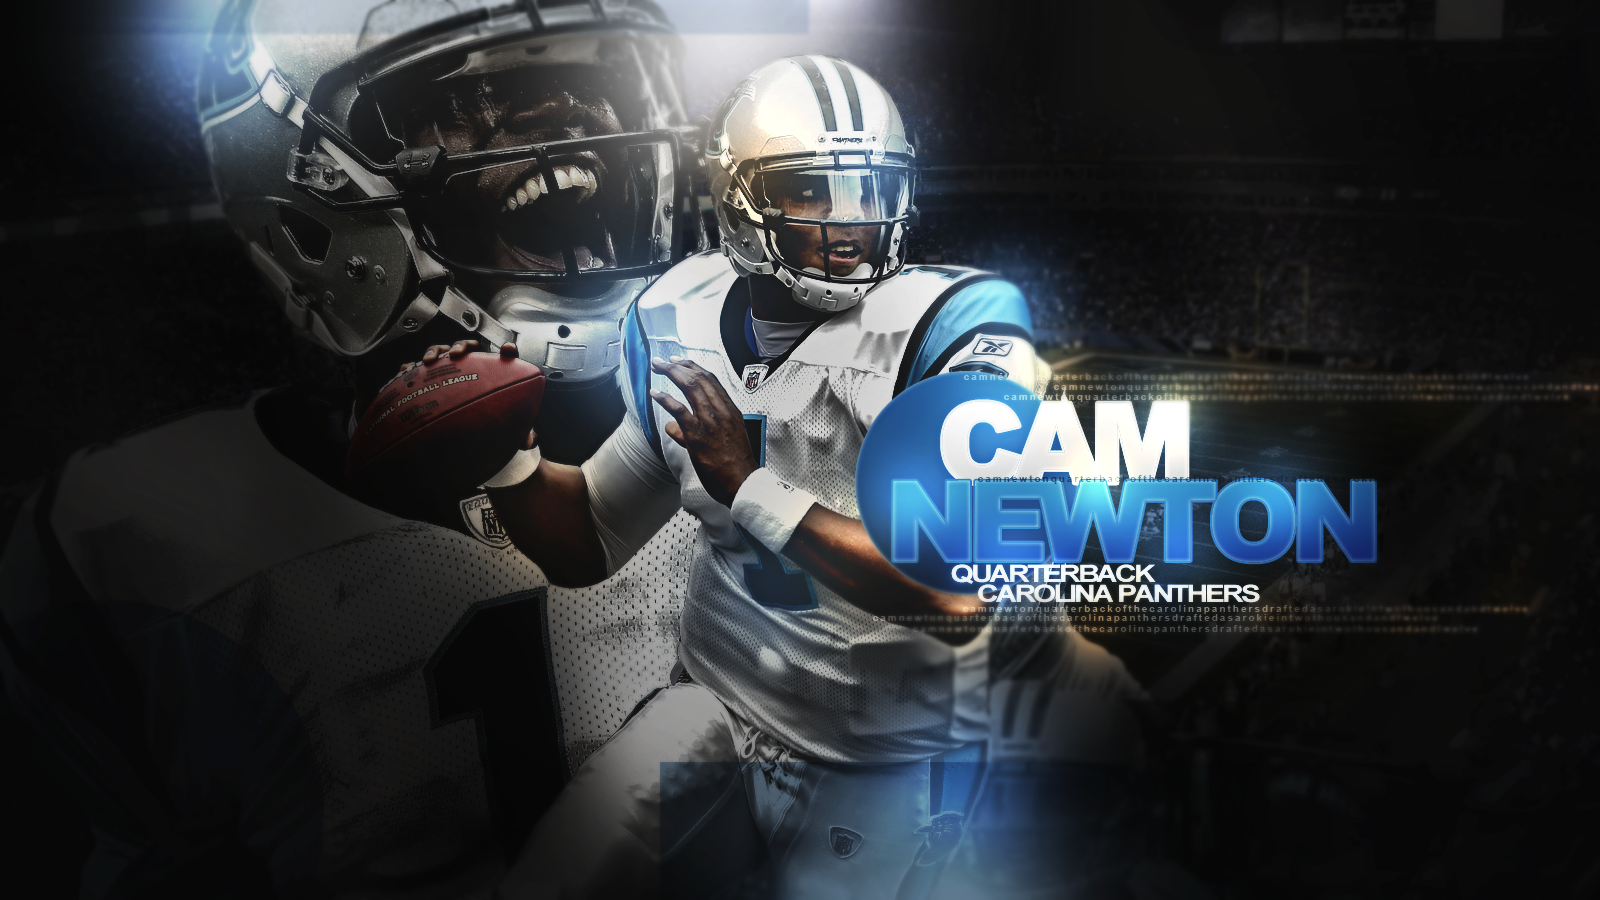 Cam Newton Wallpaper HD 1600x900